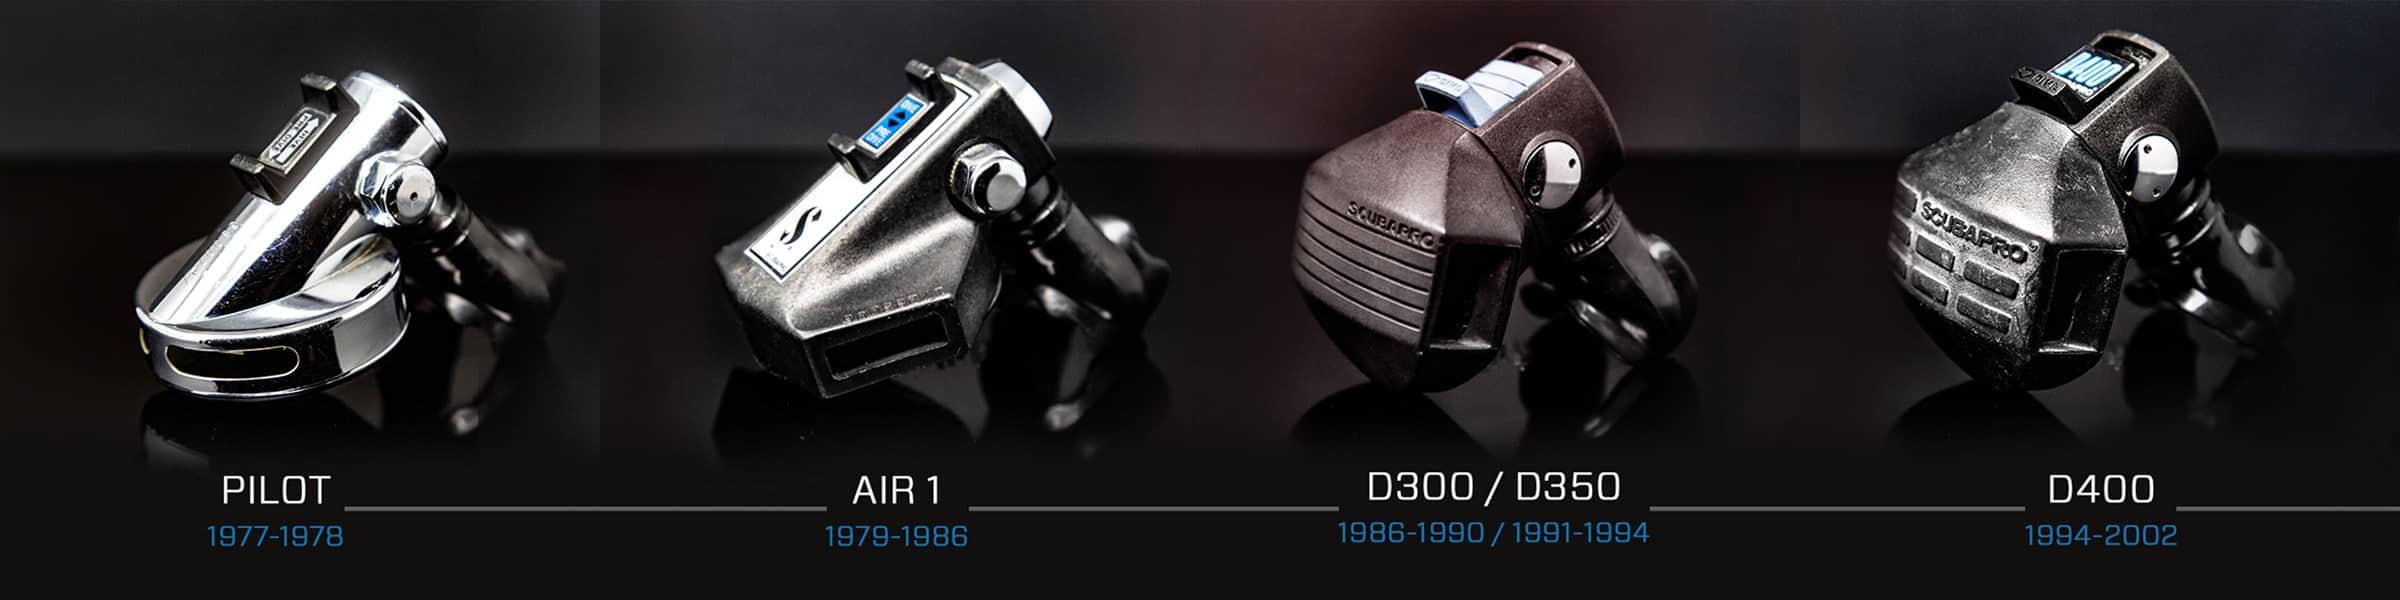 D420evolutiond24